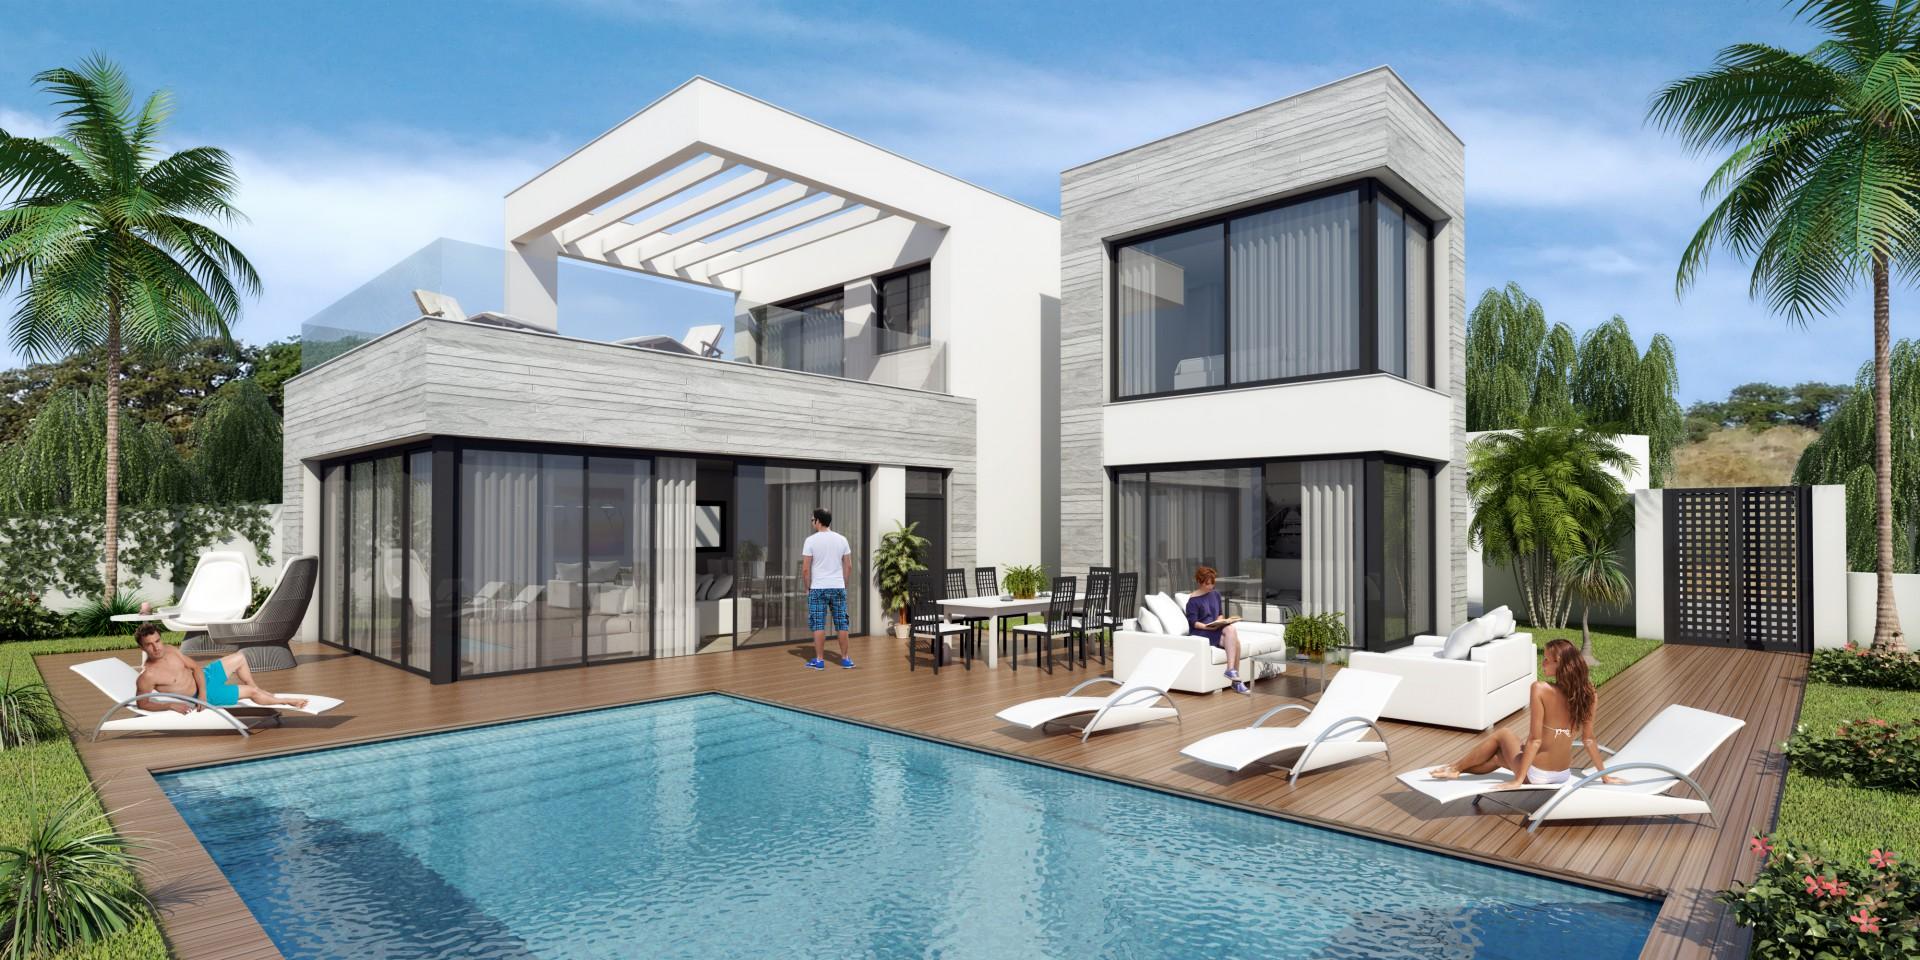 Moderne luxe villa 39 s te koop costa del sol spanje specials for Model villa moderne